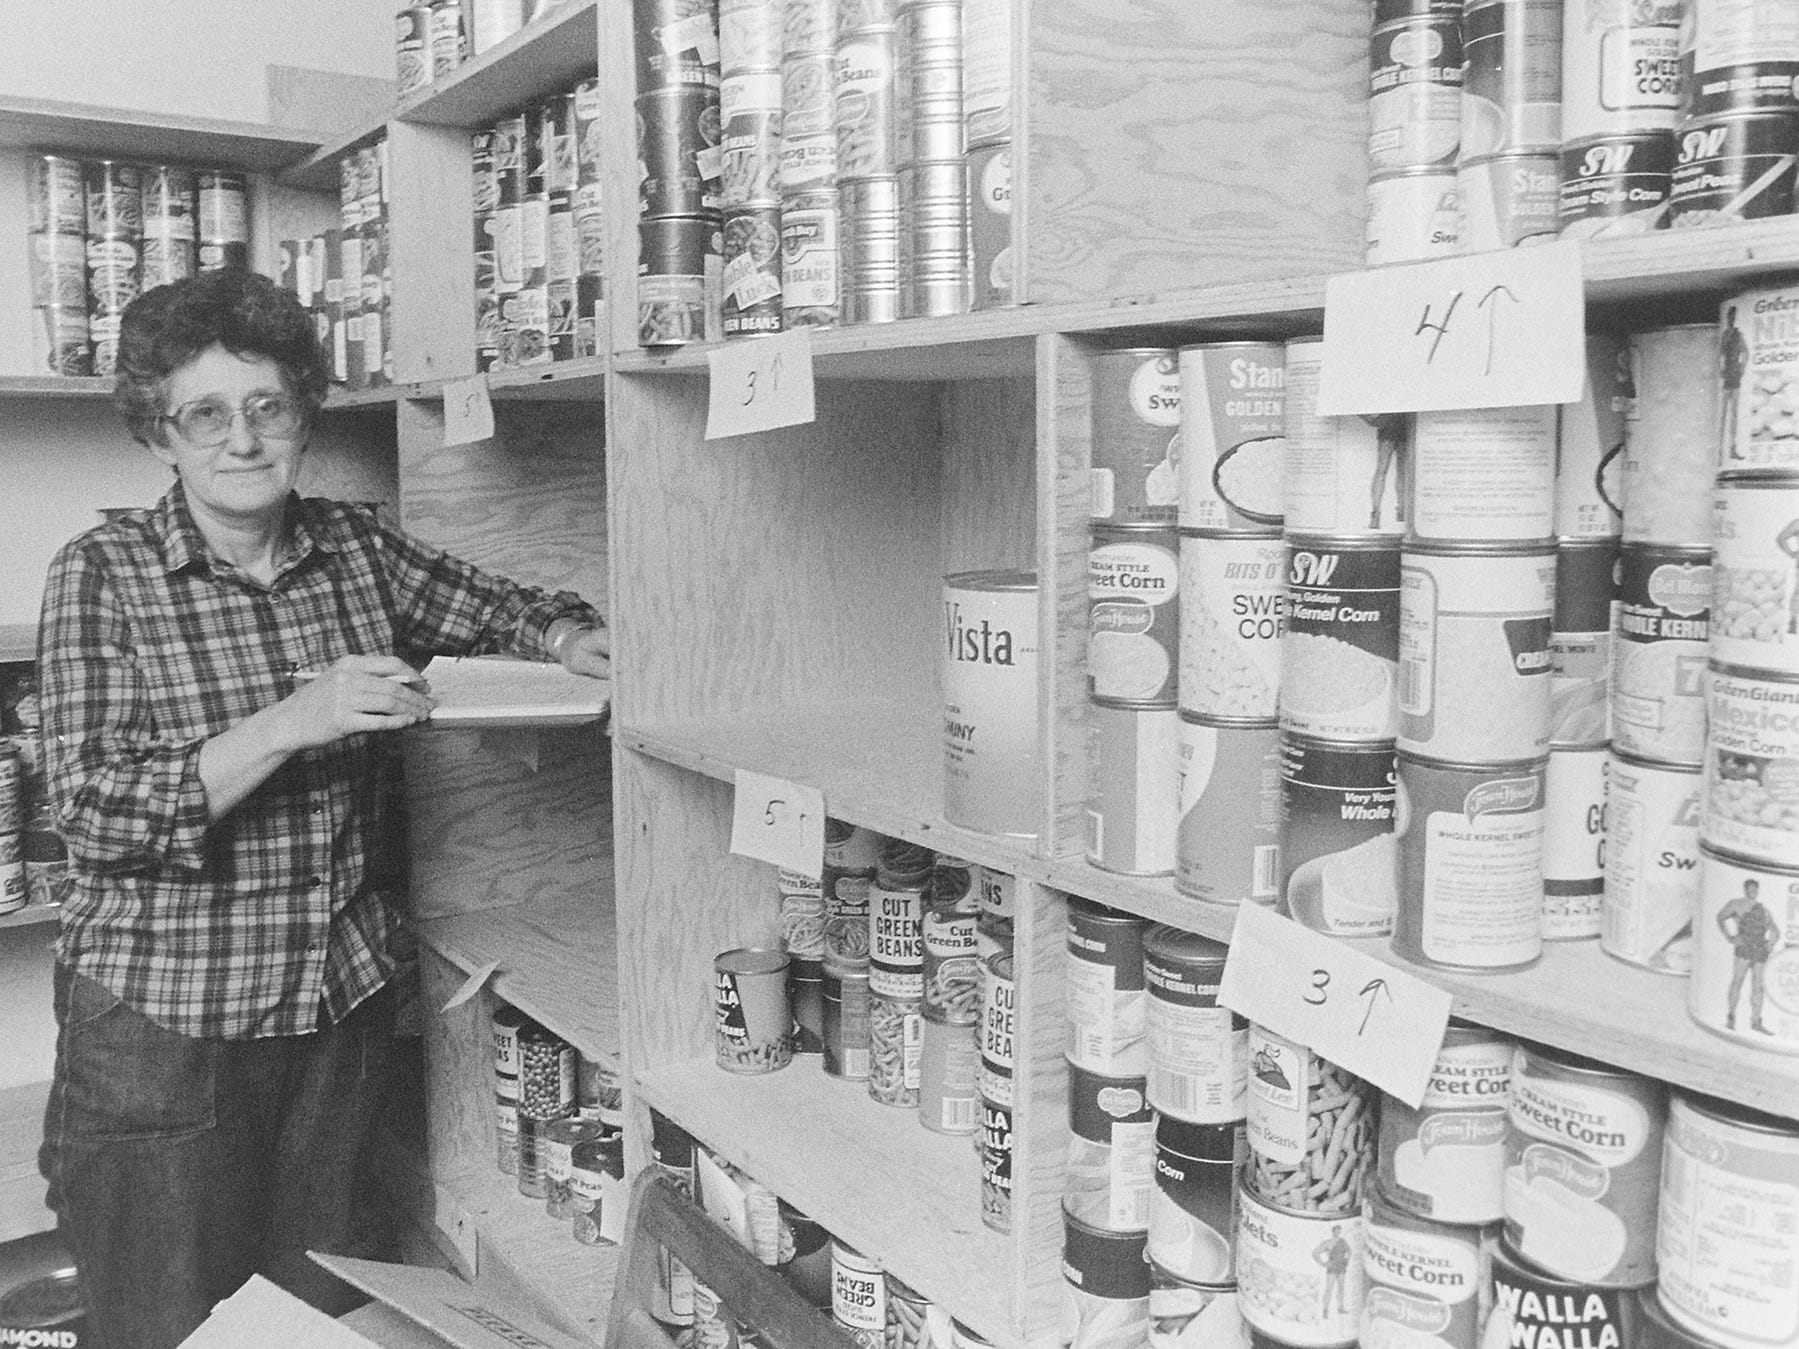 07/26/82Bremerton Food Bank